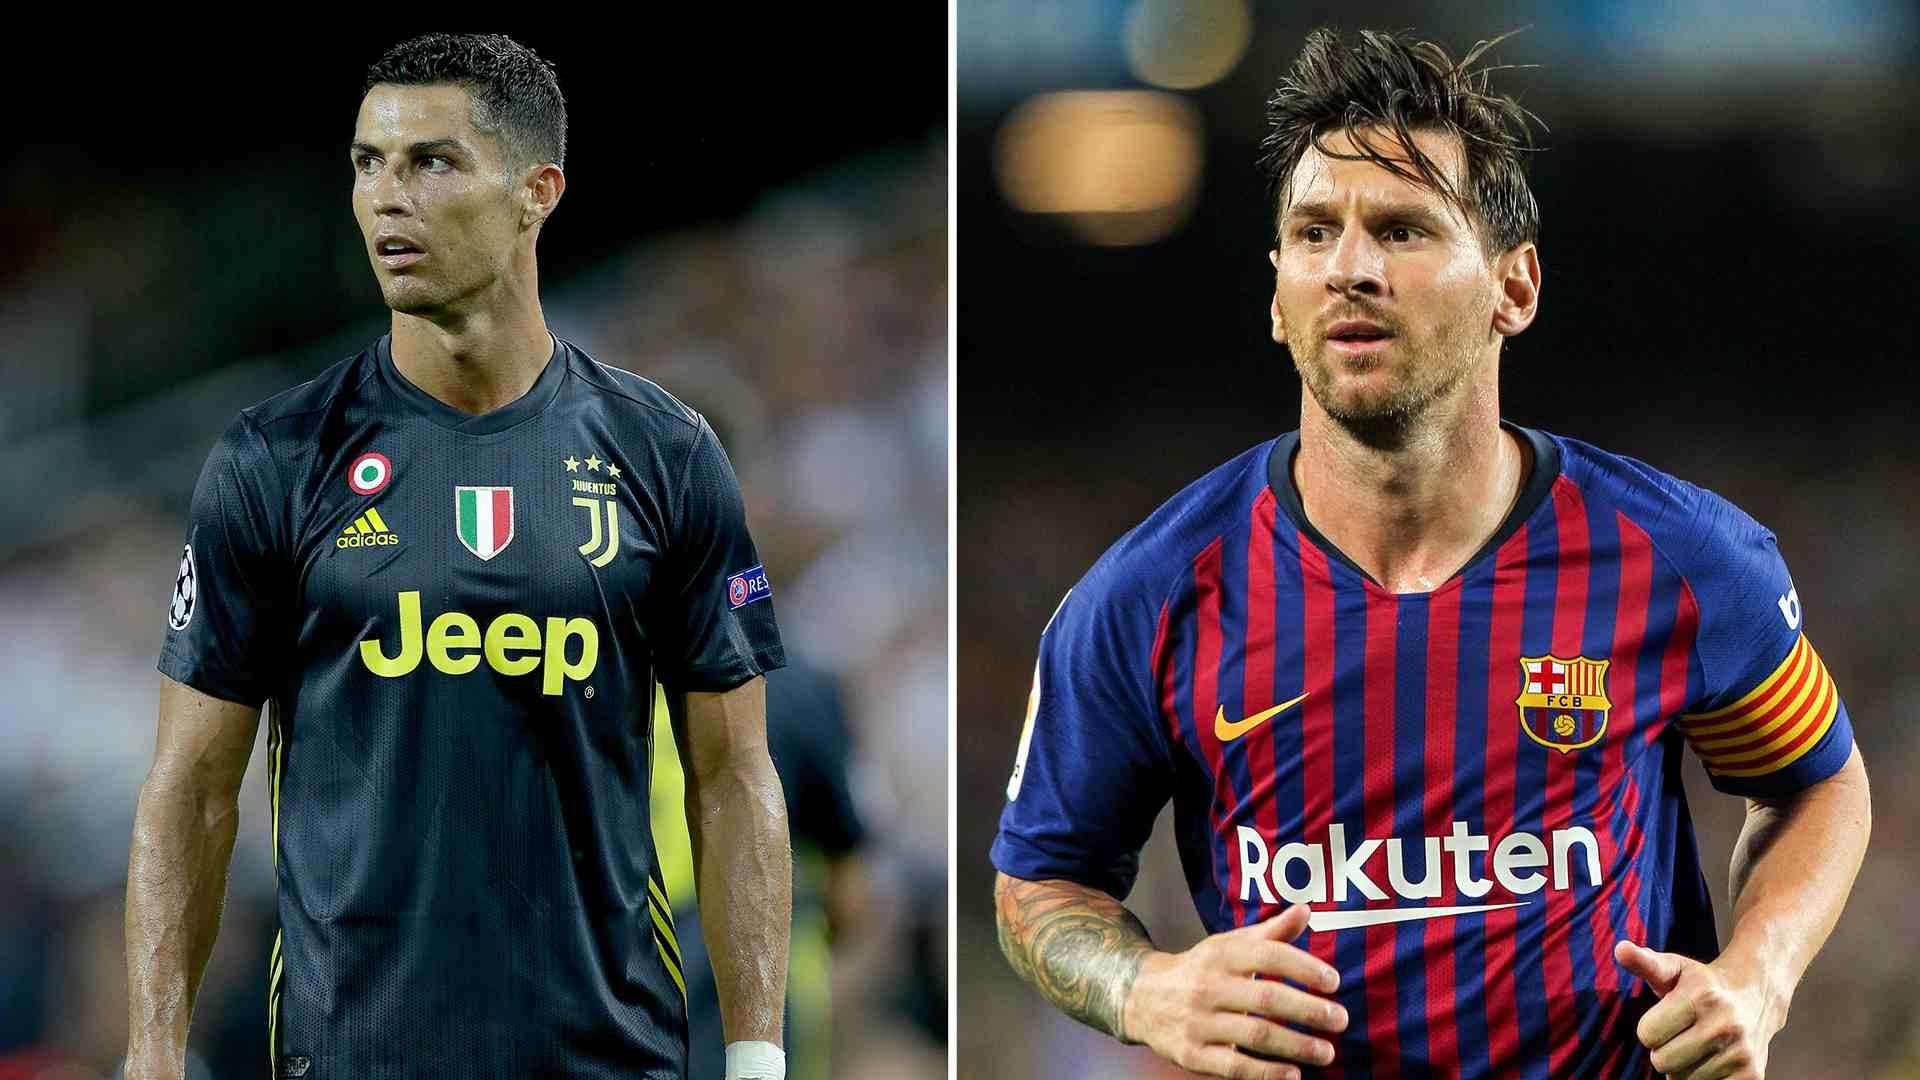 Ronaldo Messi Will Miss Fifa S The Best Awards 2018 Cgtn